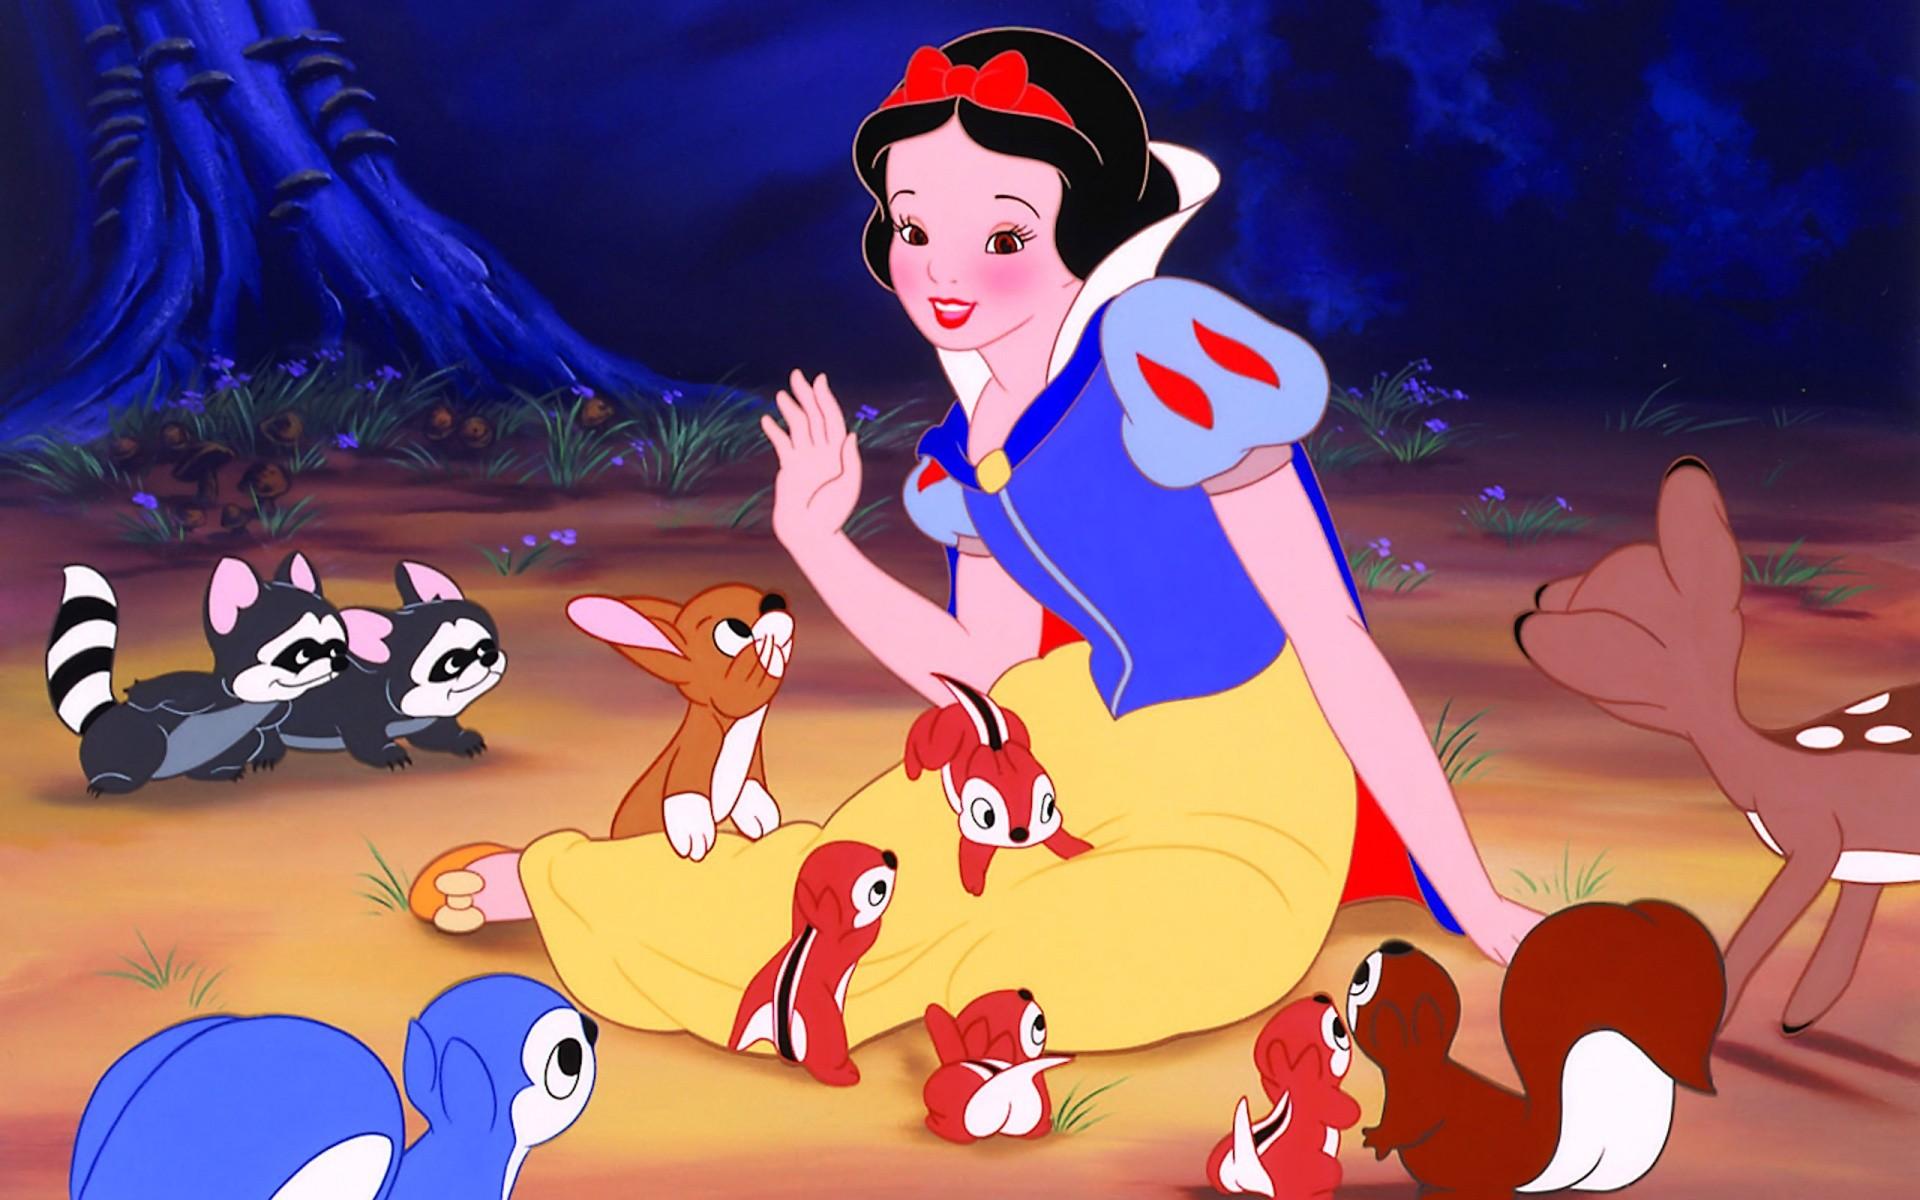 A Branca De Neve Nao Foi A Primeira Princesa Da Disney Revista